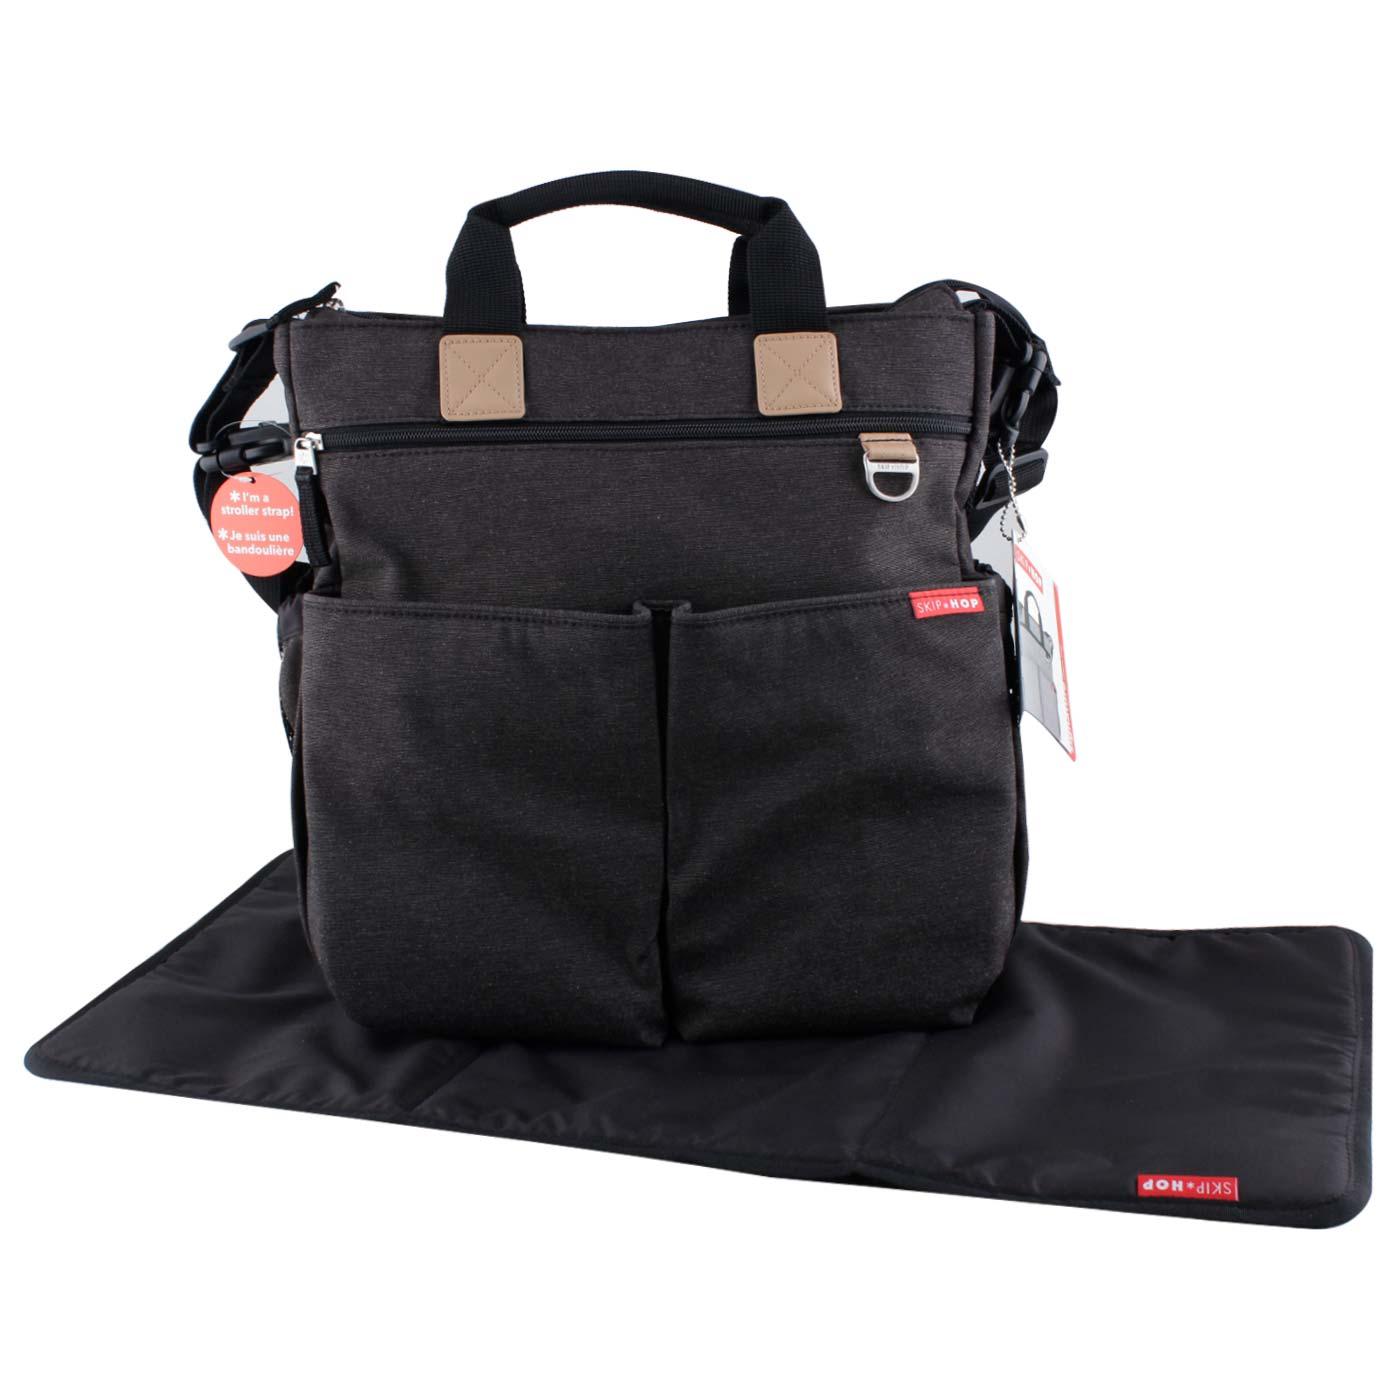 Skiphop Duo Signature Diaper Bag Soft Slate 1